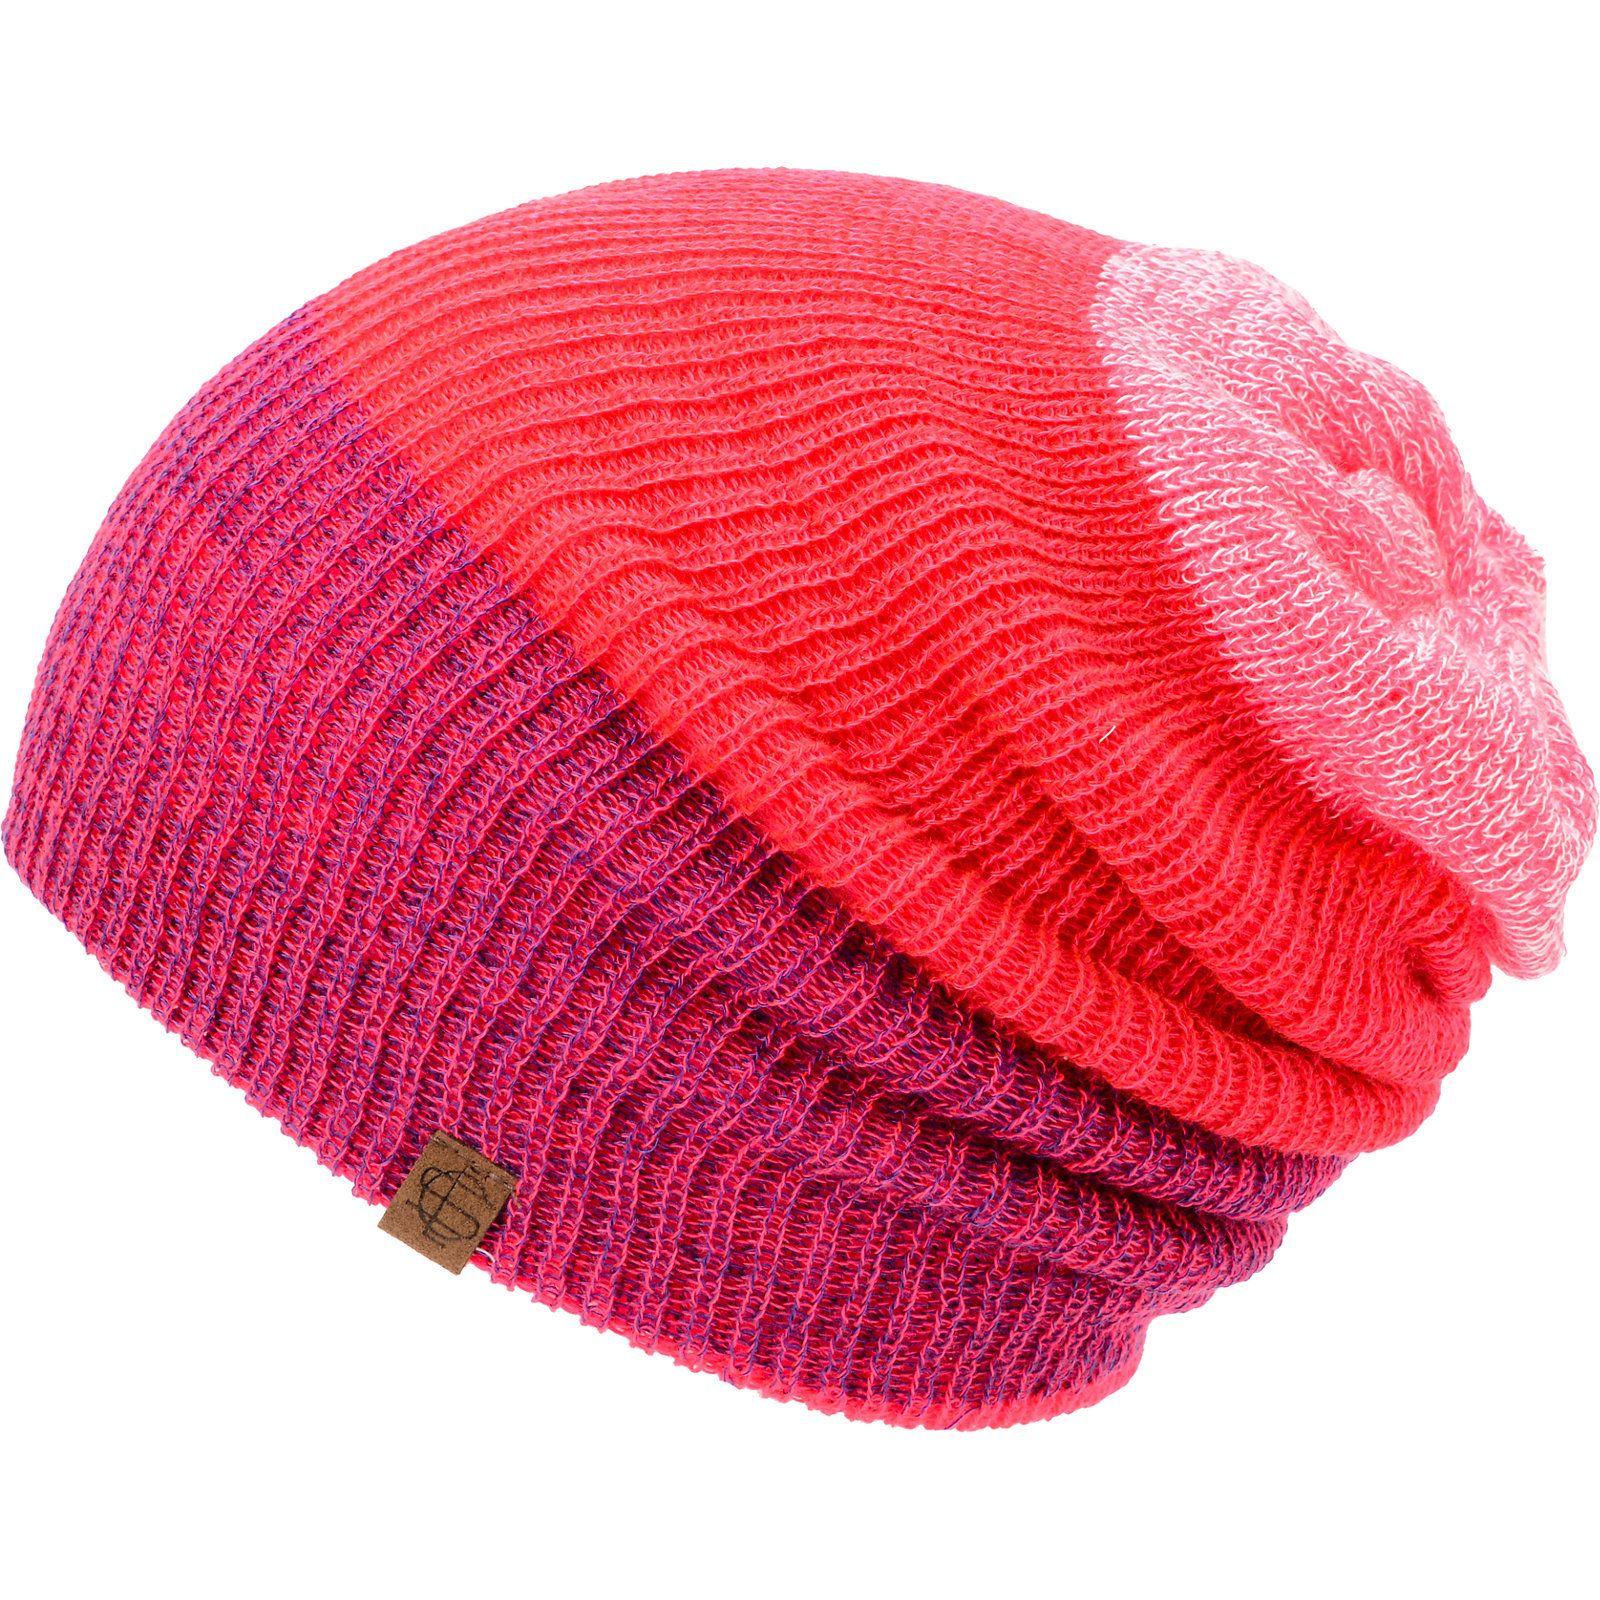 375575818b179 Empyre Girls Tabor Neon Pink Reversible Beanie at Zumiez   PDP ...